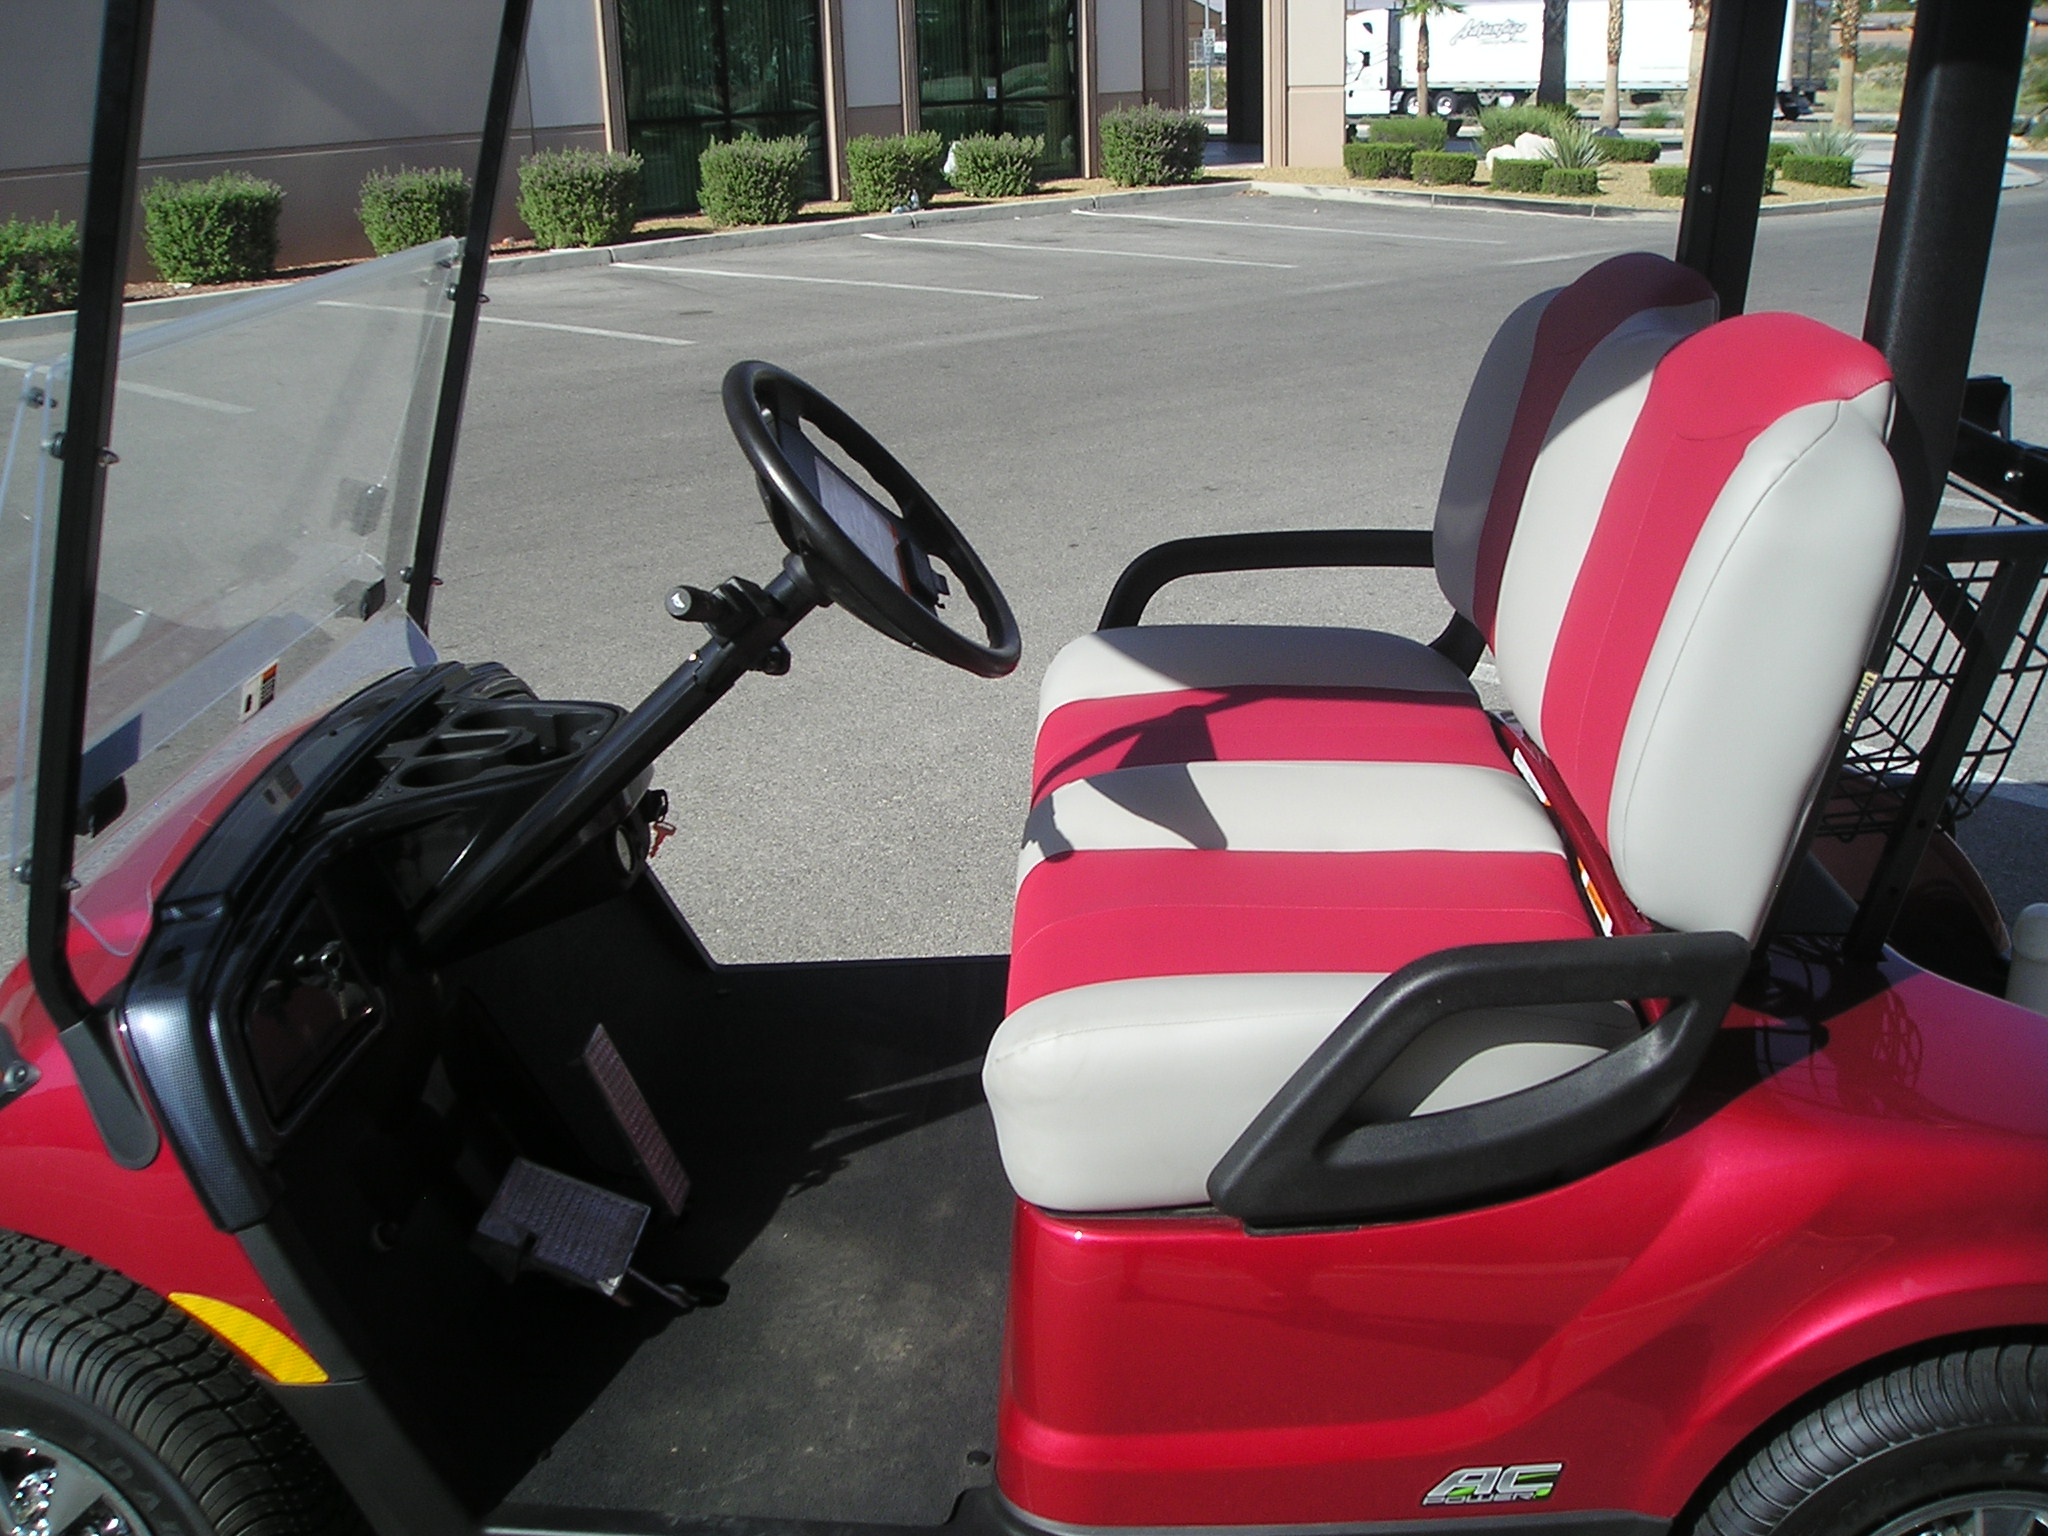 yamaha golf carts oklahoma genie blue max garage door opener wiring diagram 2016 ac drive ptv wheels in motion